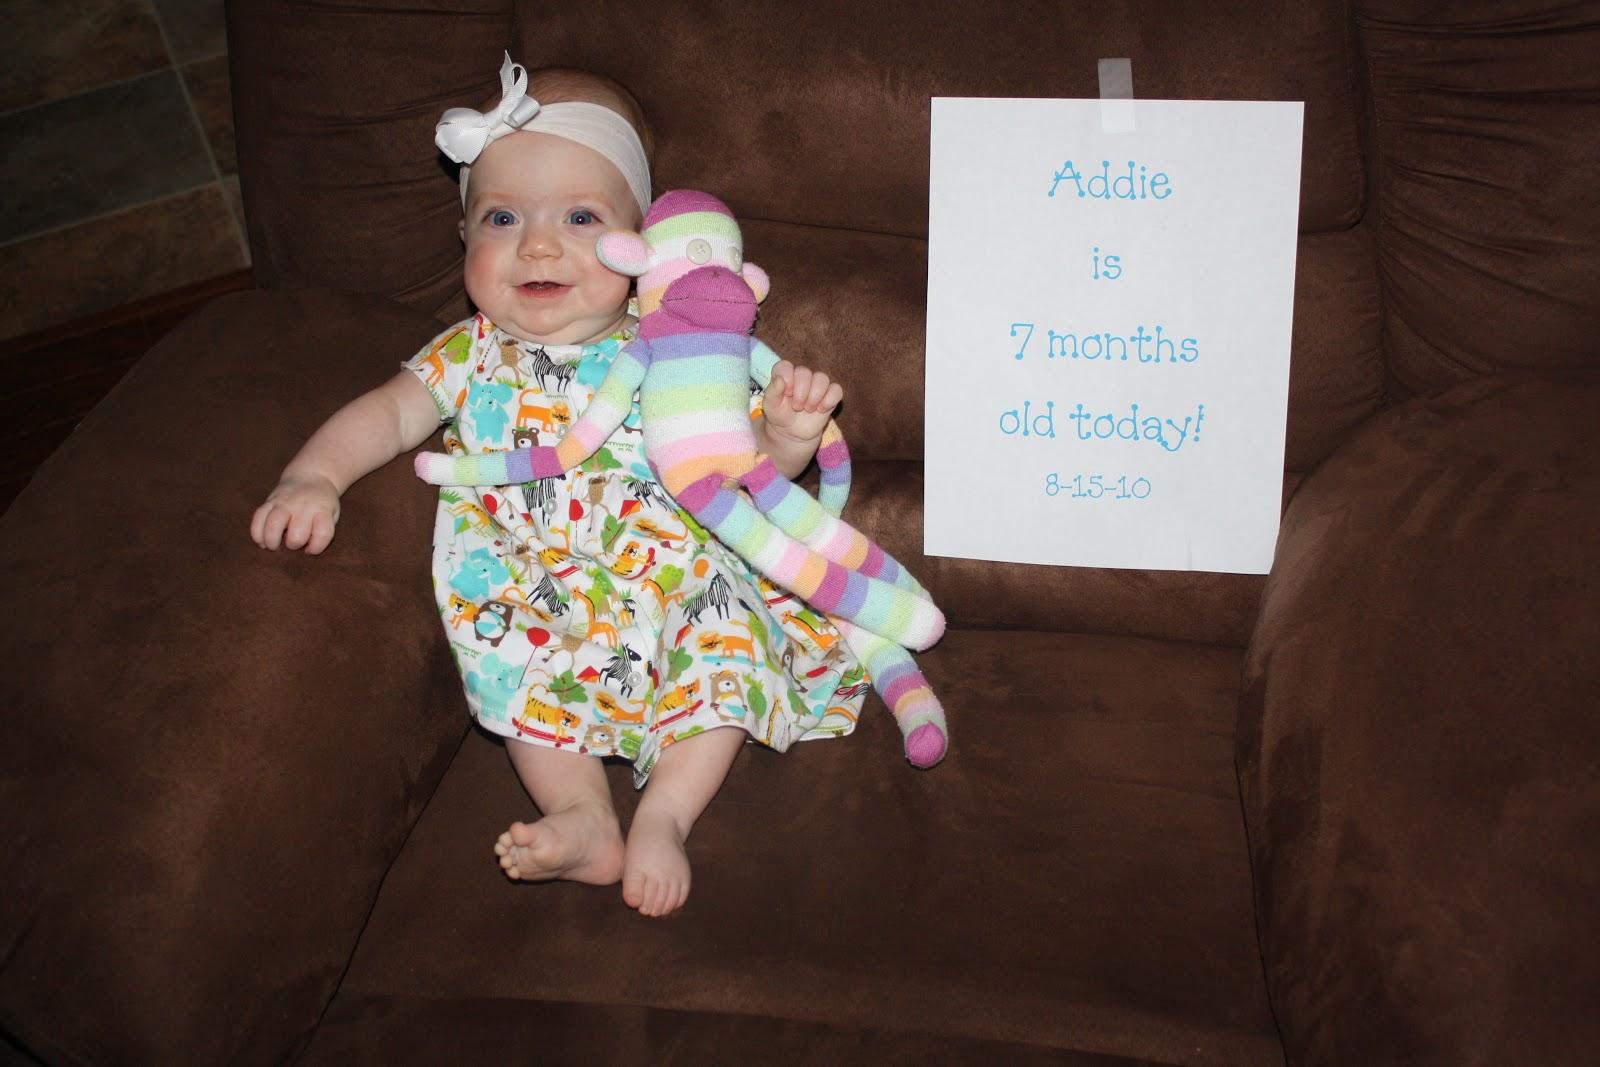 Addie loves even more